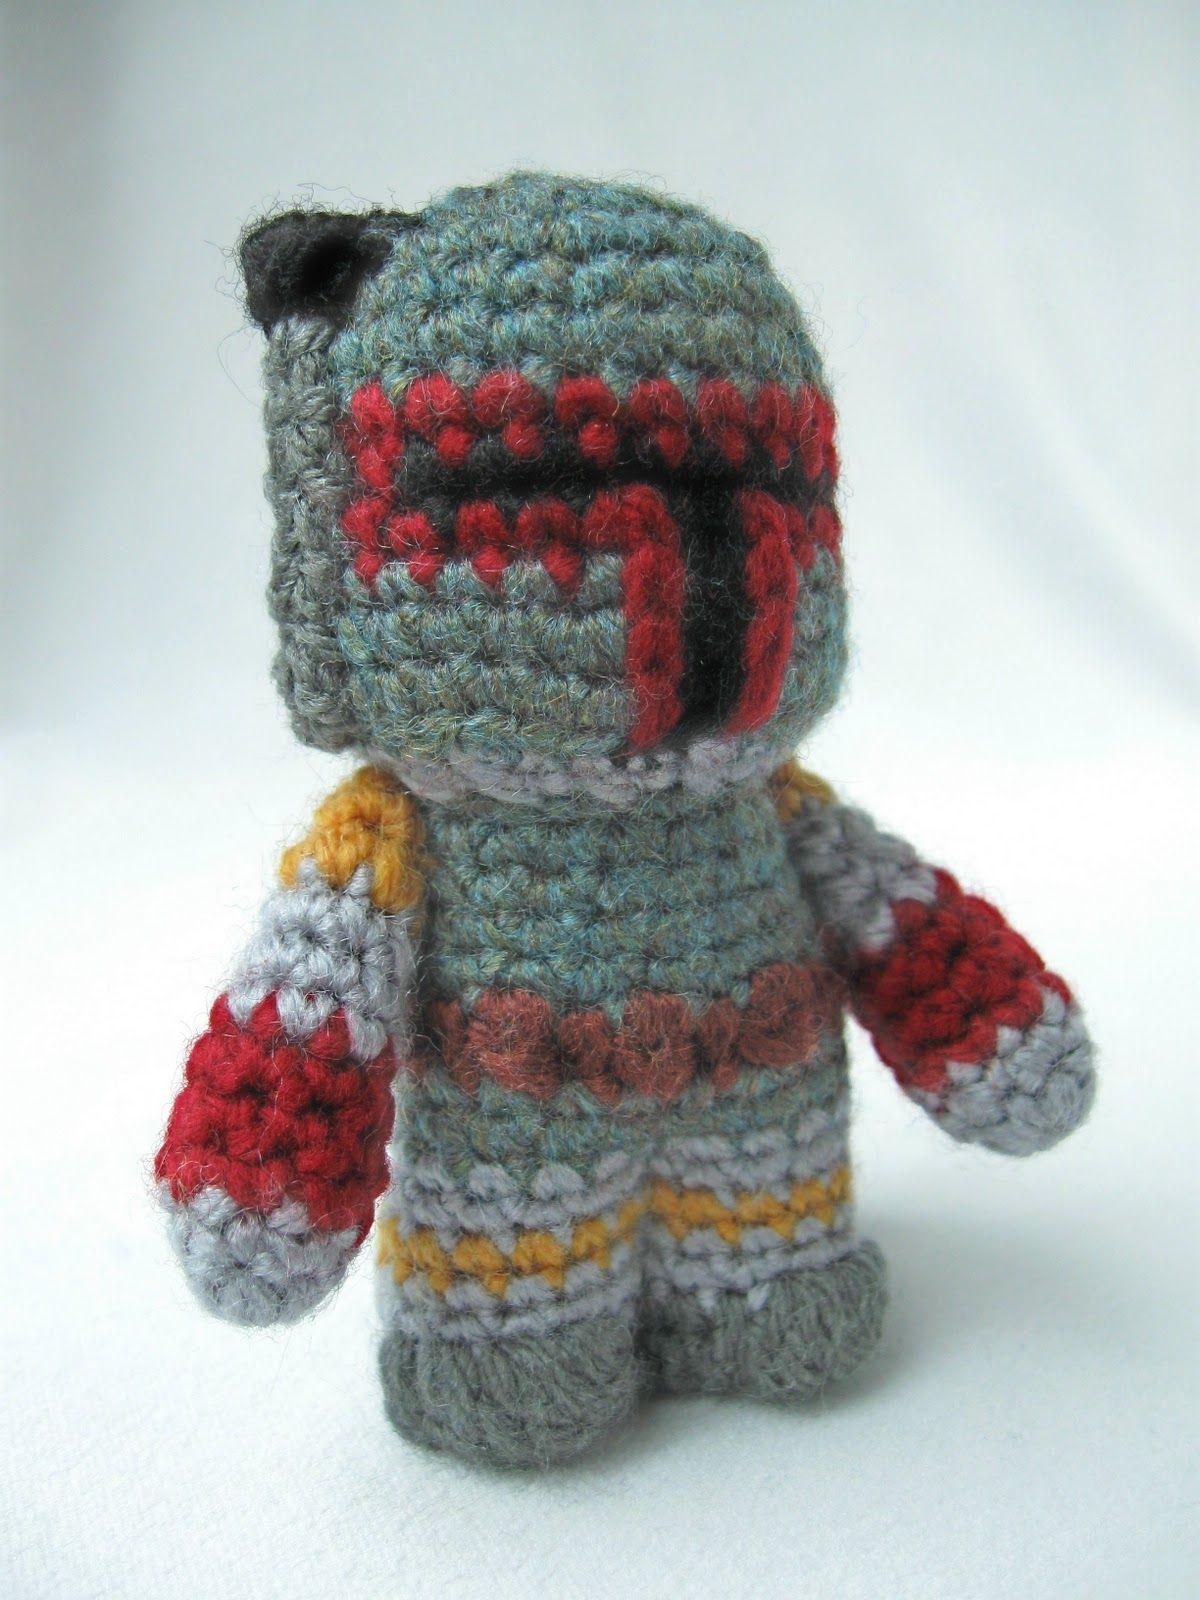 Free crochet amigurumis star wars google search crochet crazy free crochet amigurumis star wars google search bankloansurffo Images